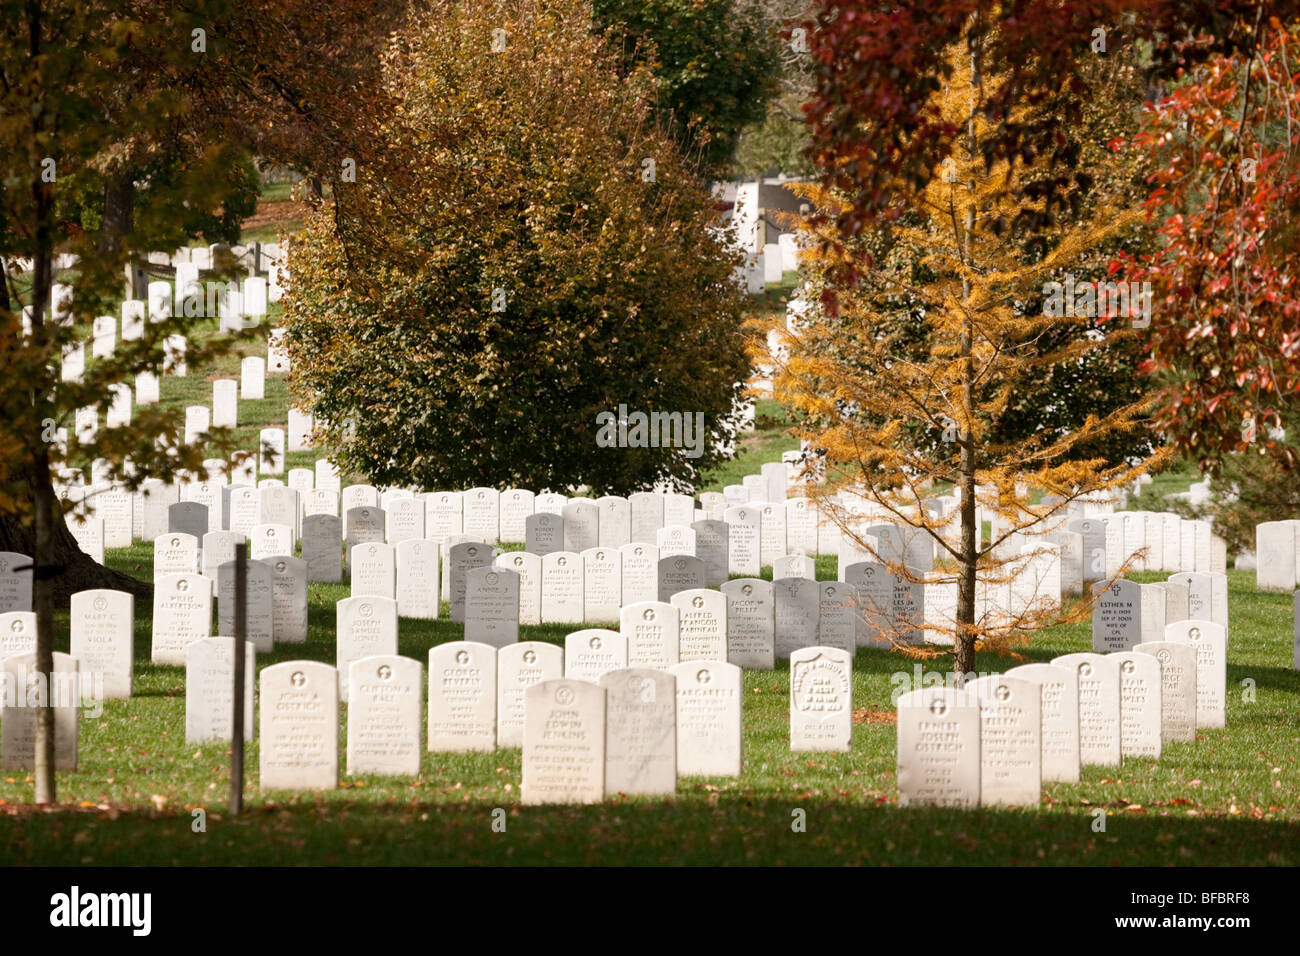 Autumn Fall In Arlington Cemetery Stock Photos & Autumn Fall In ...